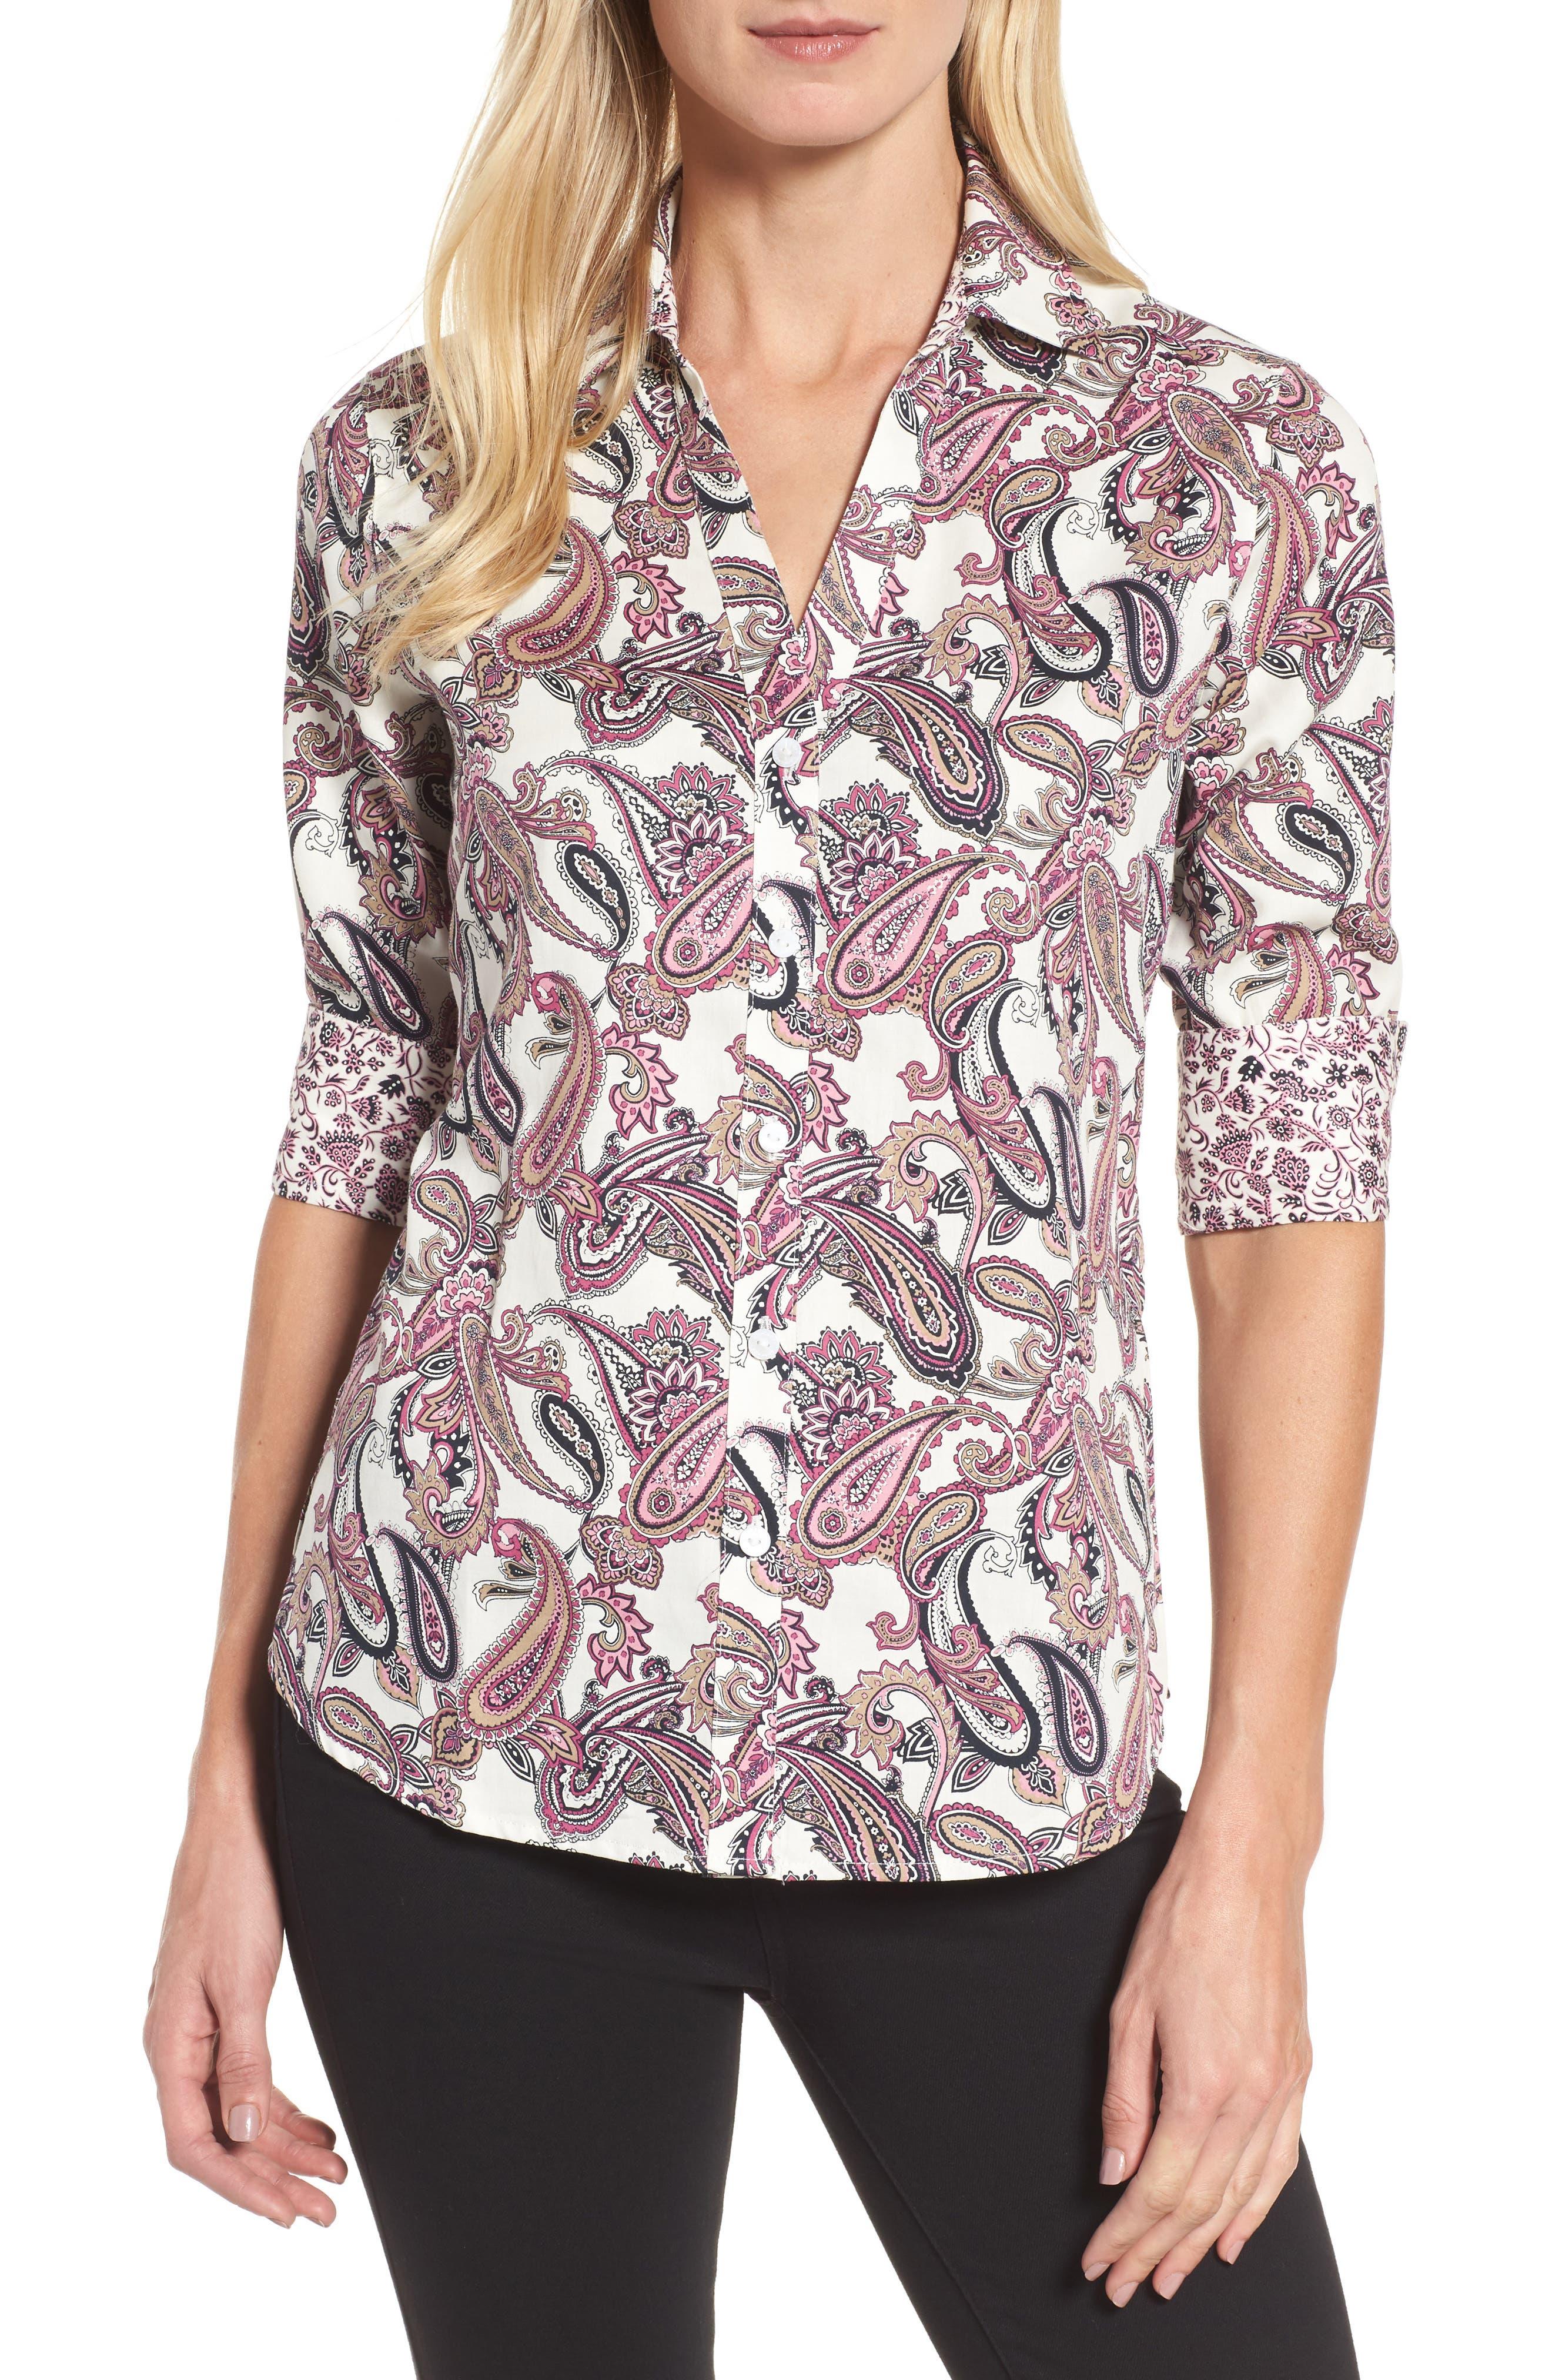 Mary Paisley Wrinkle Free Shirt,                         Main,                         color, Roseberry